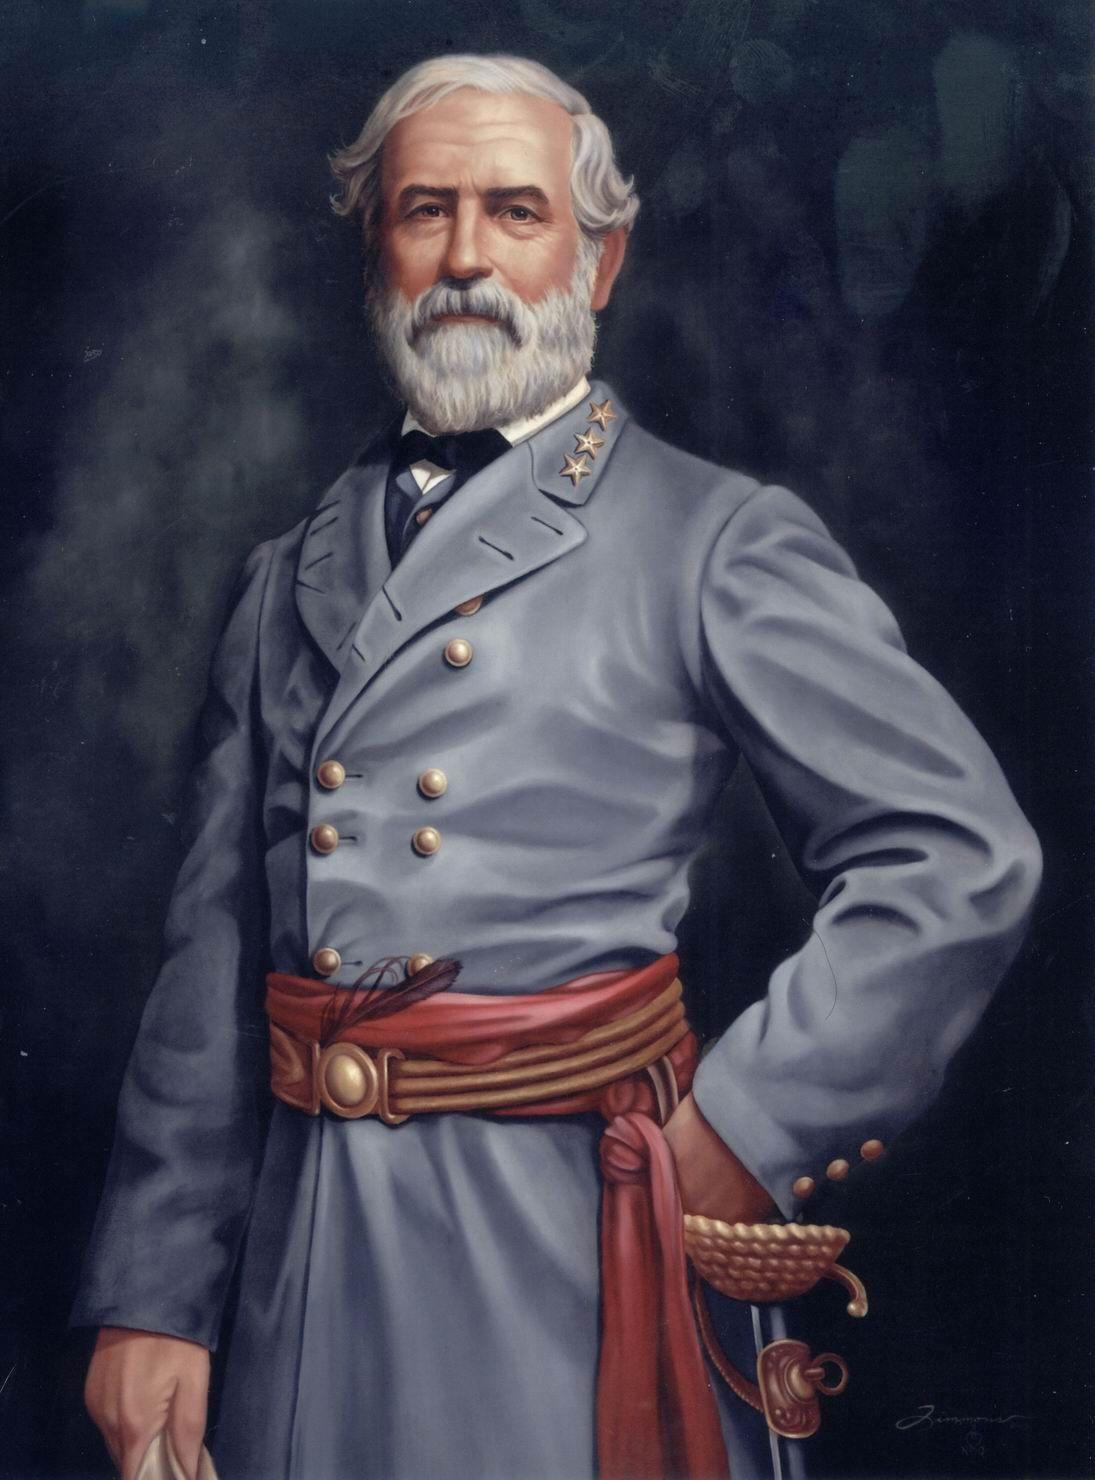 Robert E Lee US Civil War Photo Painting Real Canvas Art Print Confederate Gen